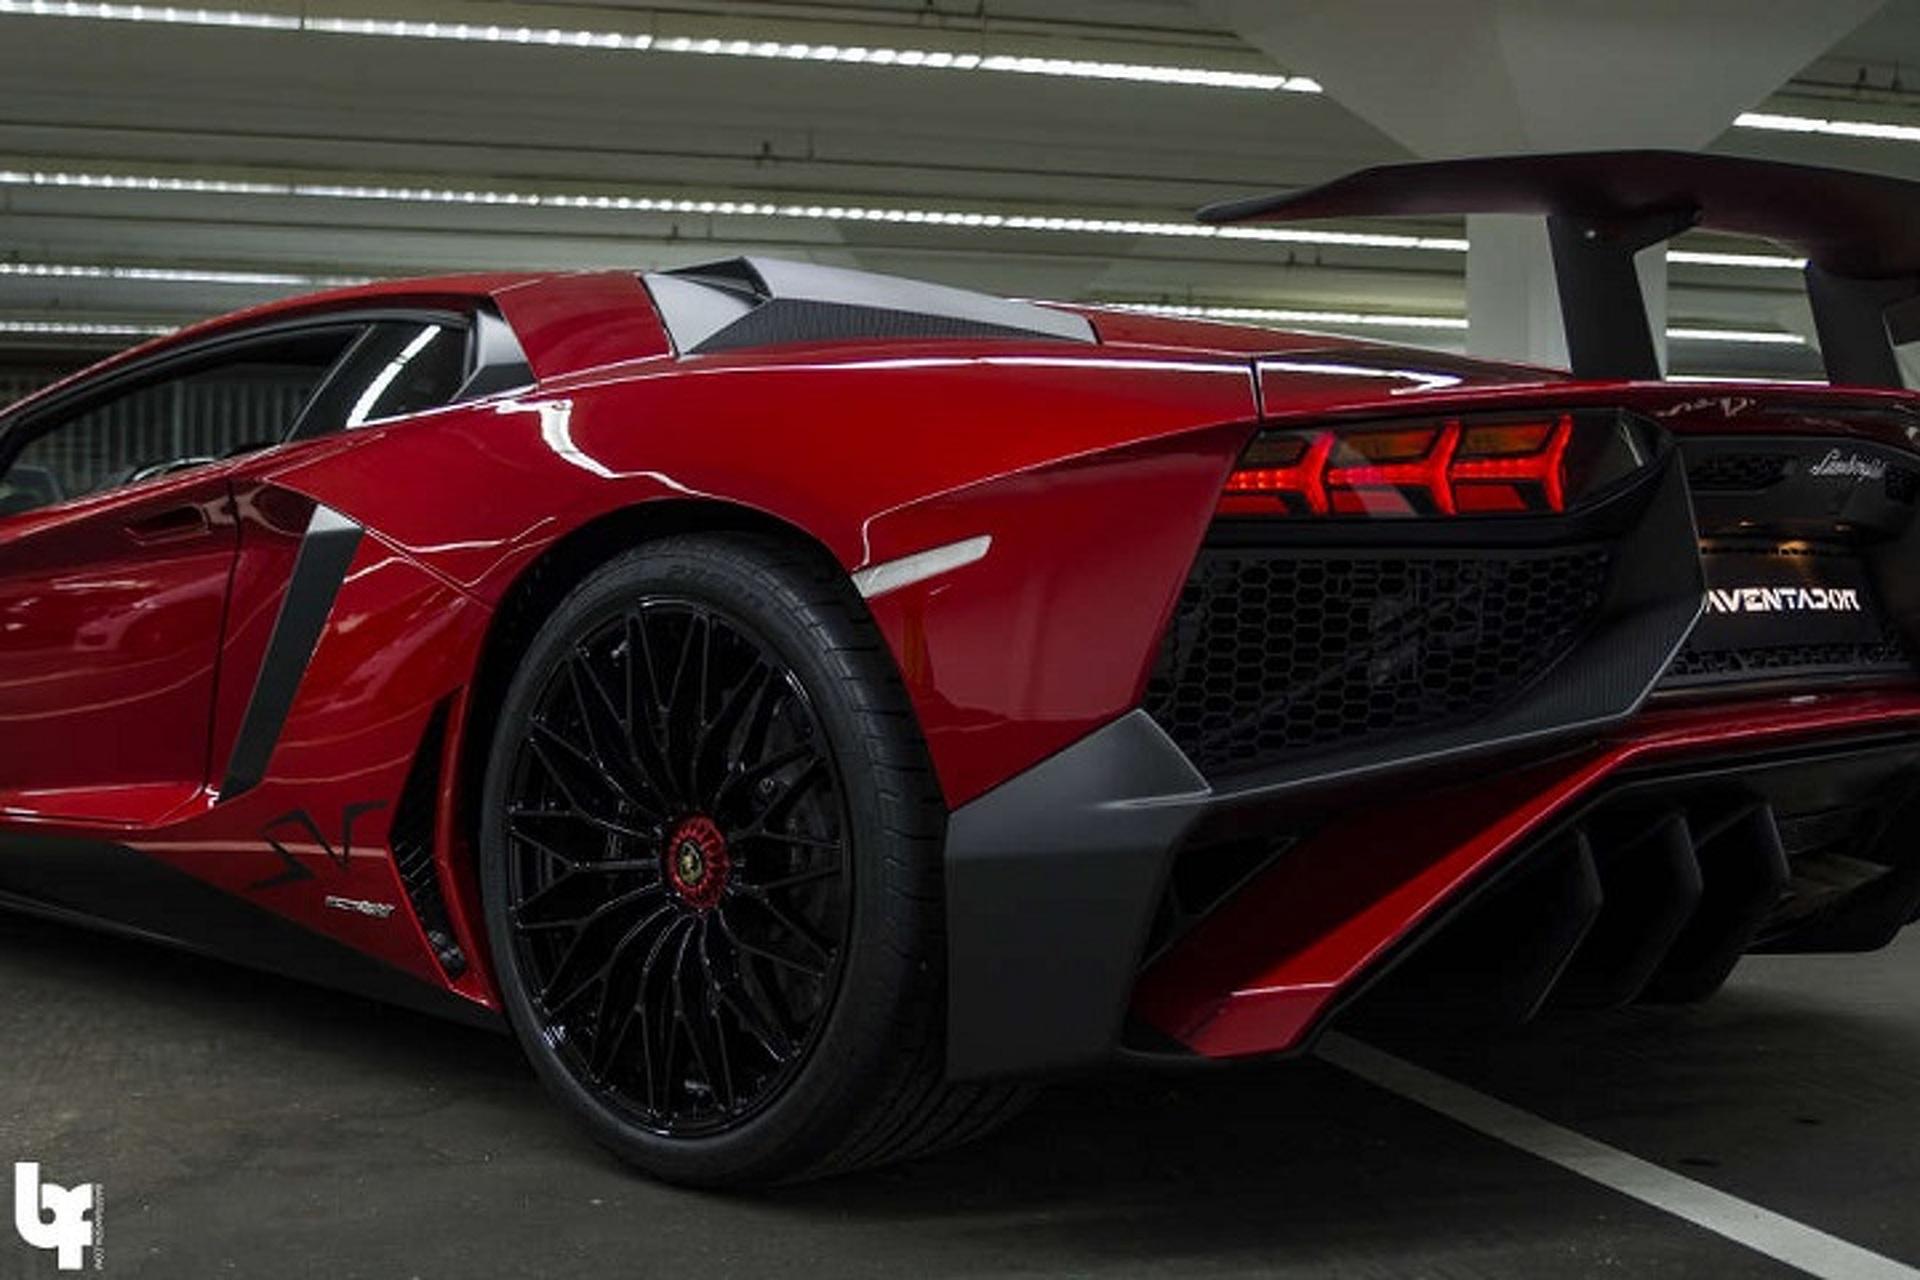 DJ Afrojack and His Blood Red Lamborghini Aventador SV